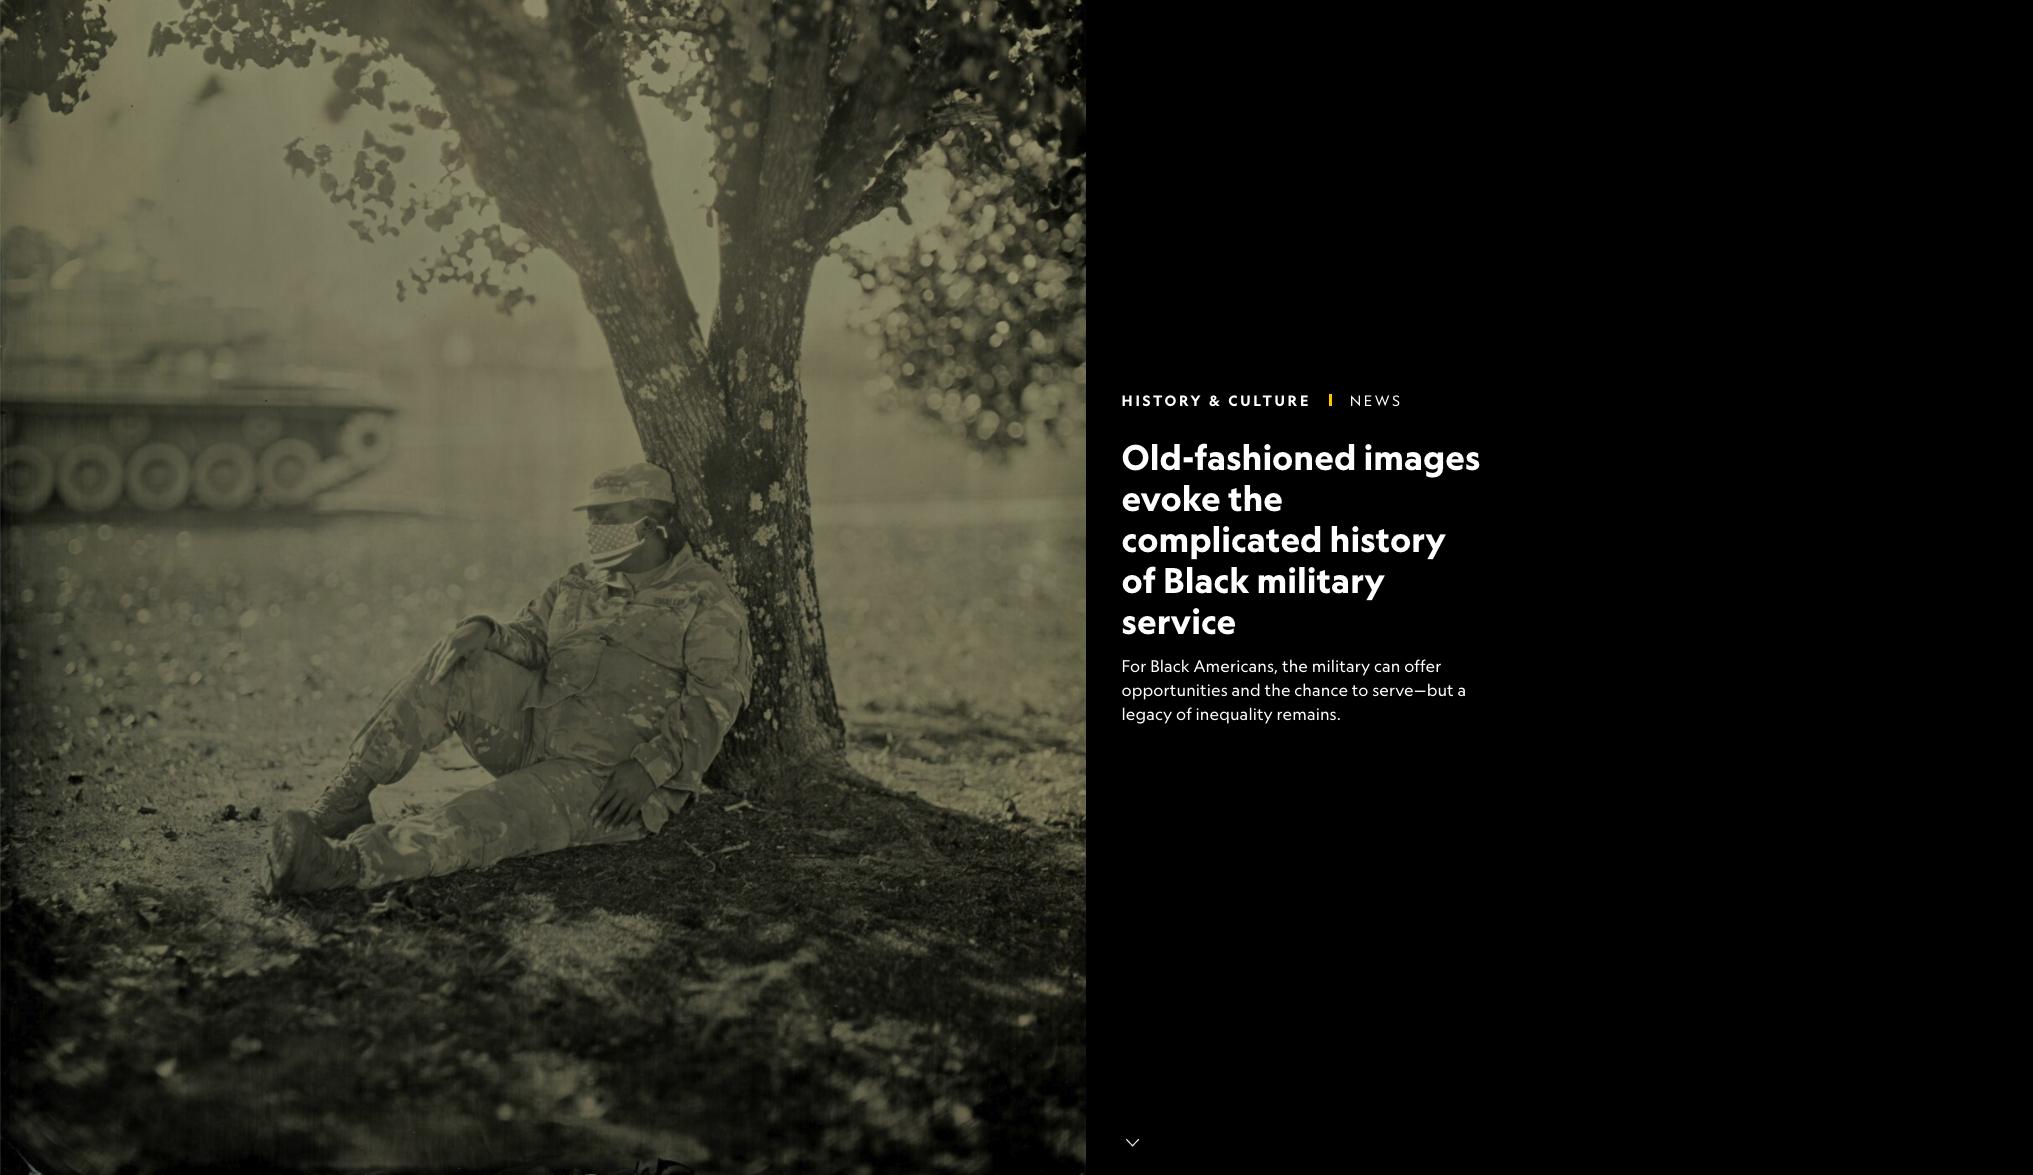 Rashod Taylor for National Geographic